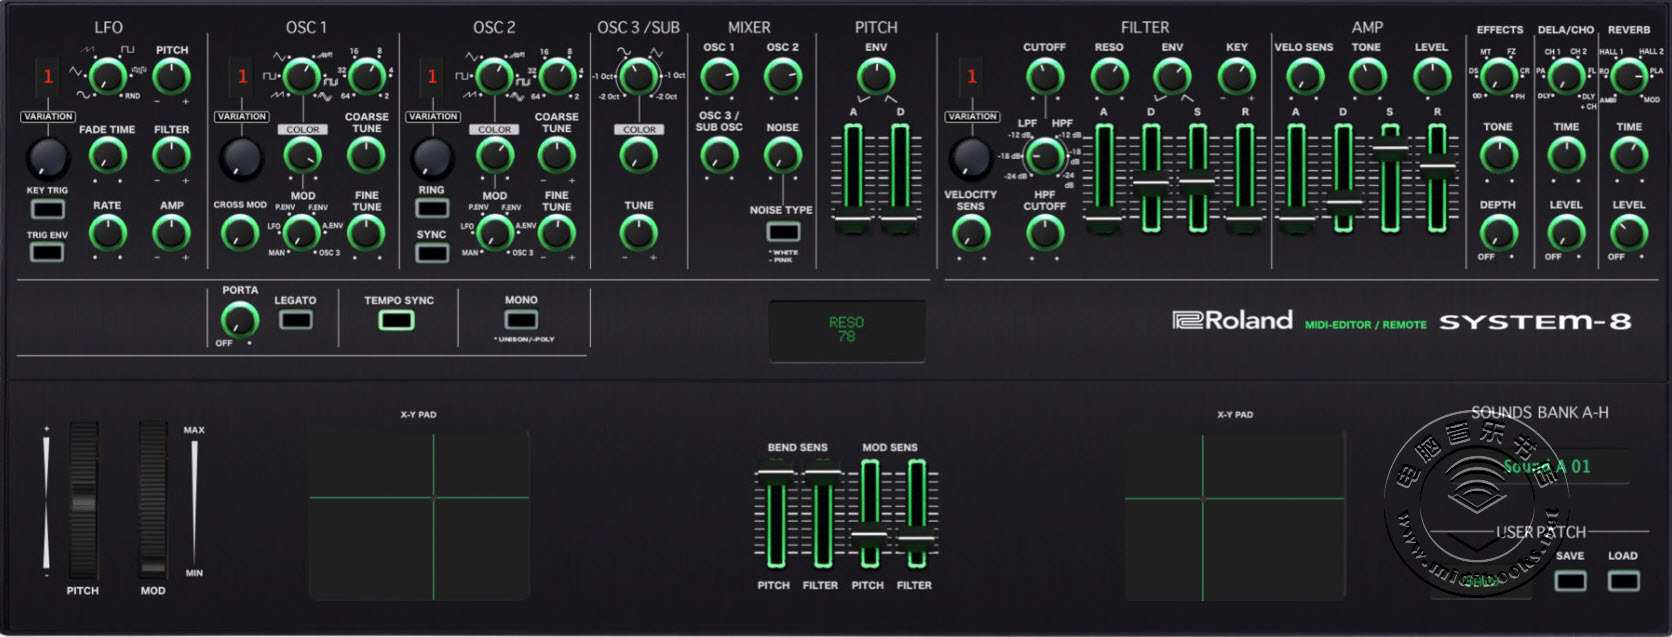 Momo发布可用于Roland合成器的System-8编辑器